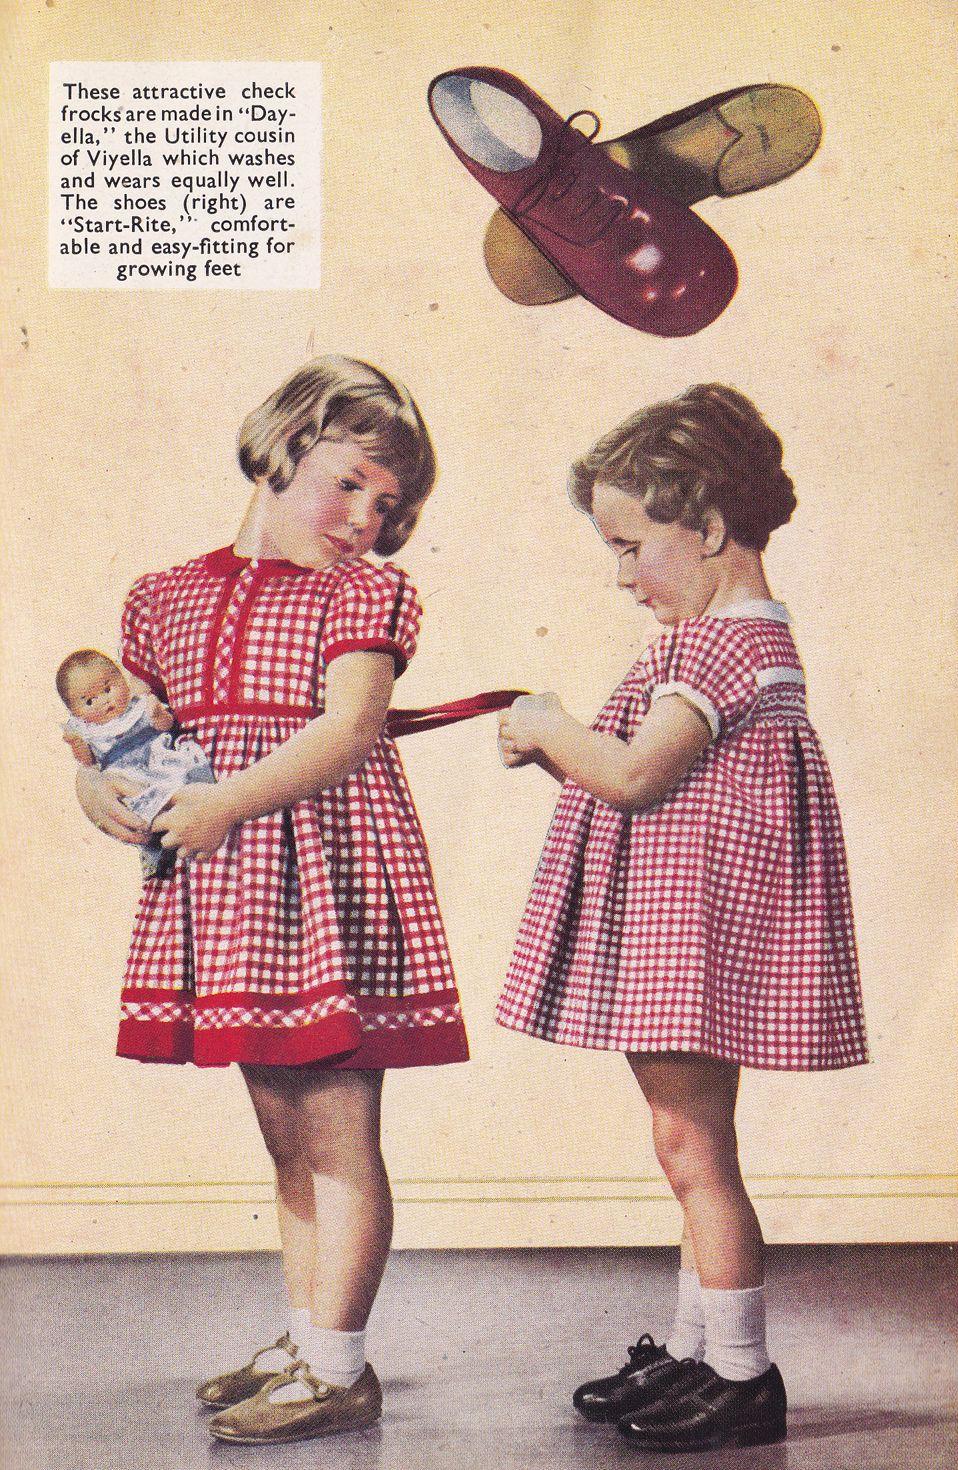 1940s Children\'s Utility dresses | fashion in the 40s | Pinterest